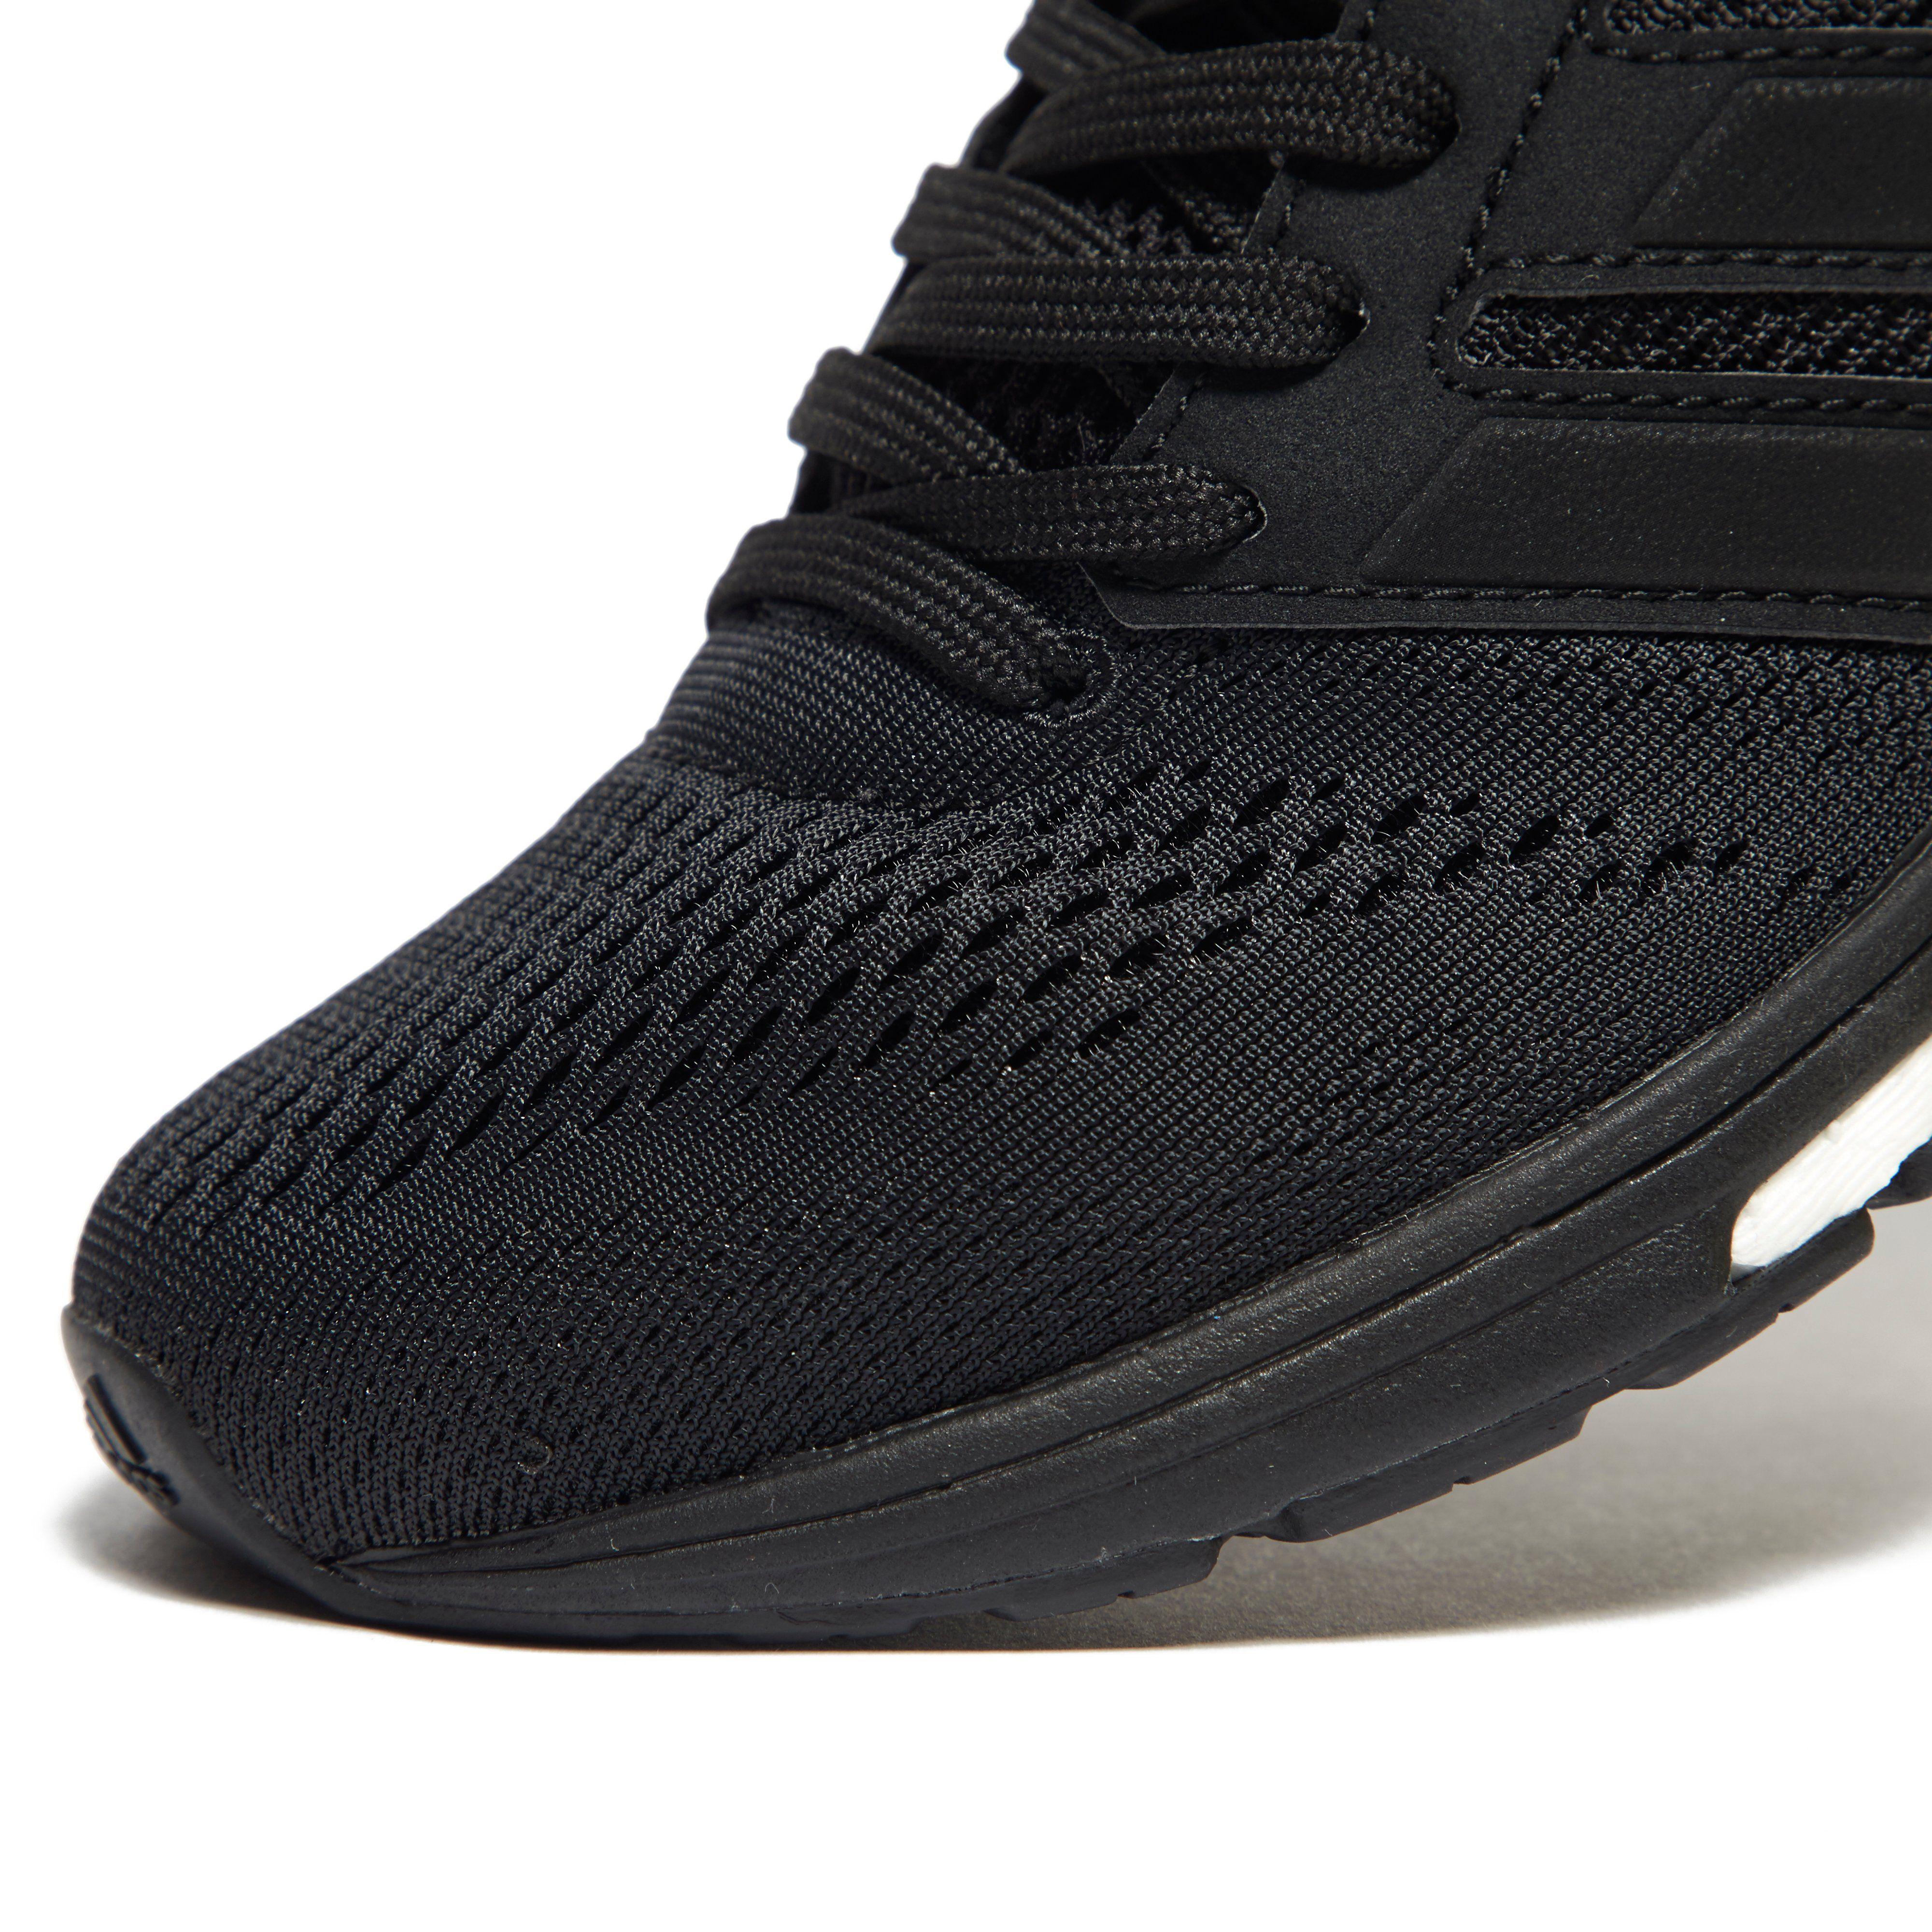 adidas Adizero Boston 7 Women's Running Shoes